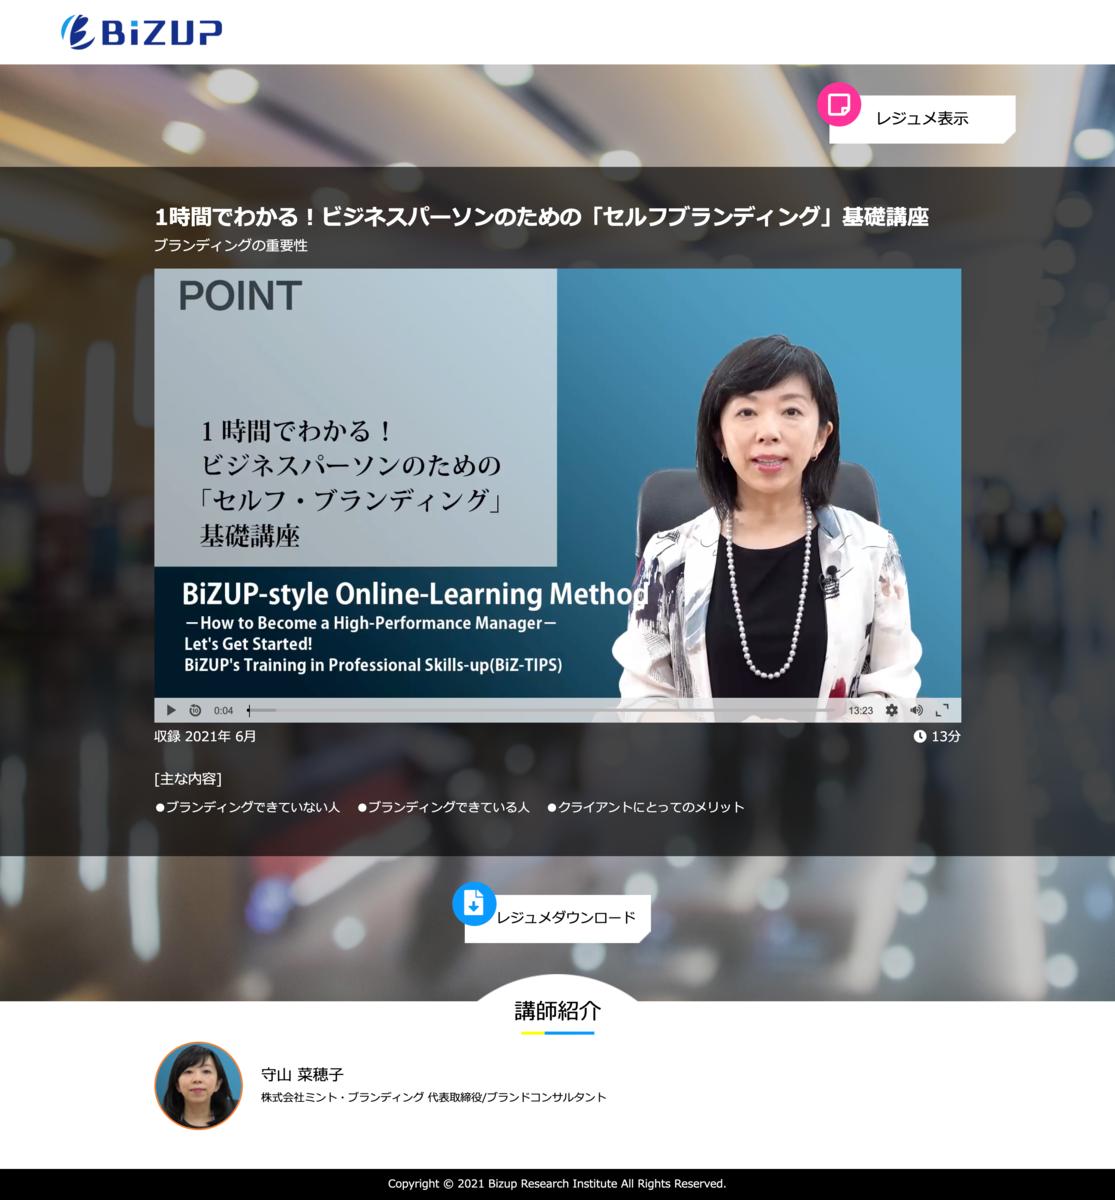 f:id:naoko-moriyama:20210823195013p:plain